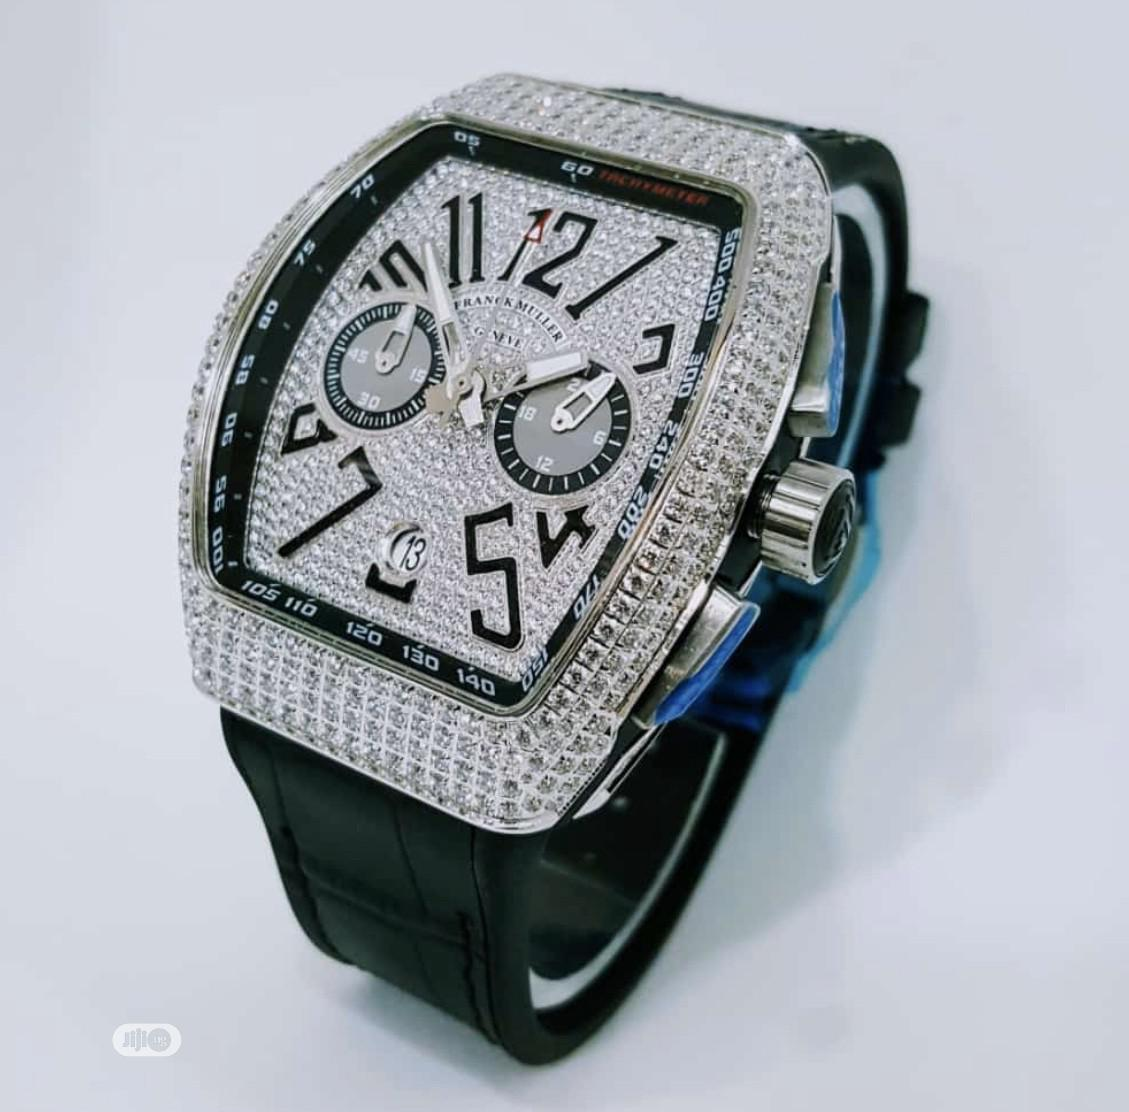 Archive: New Franck Muller Black Leather Wristwatch / Wrist Watch